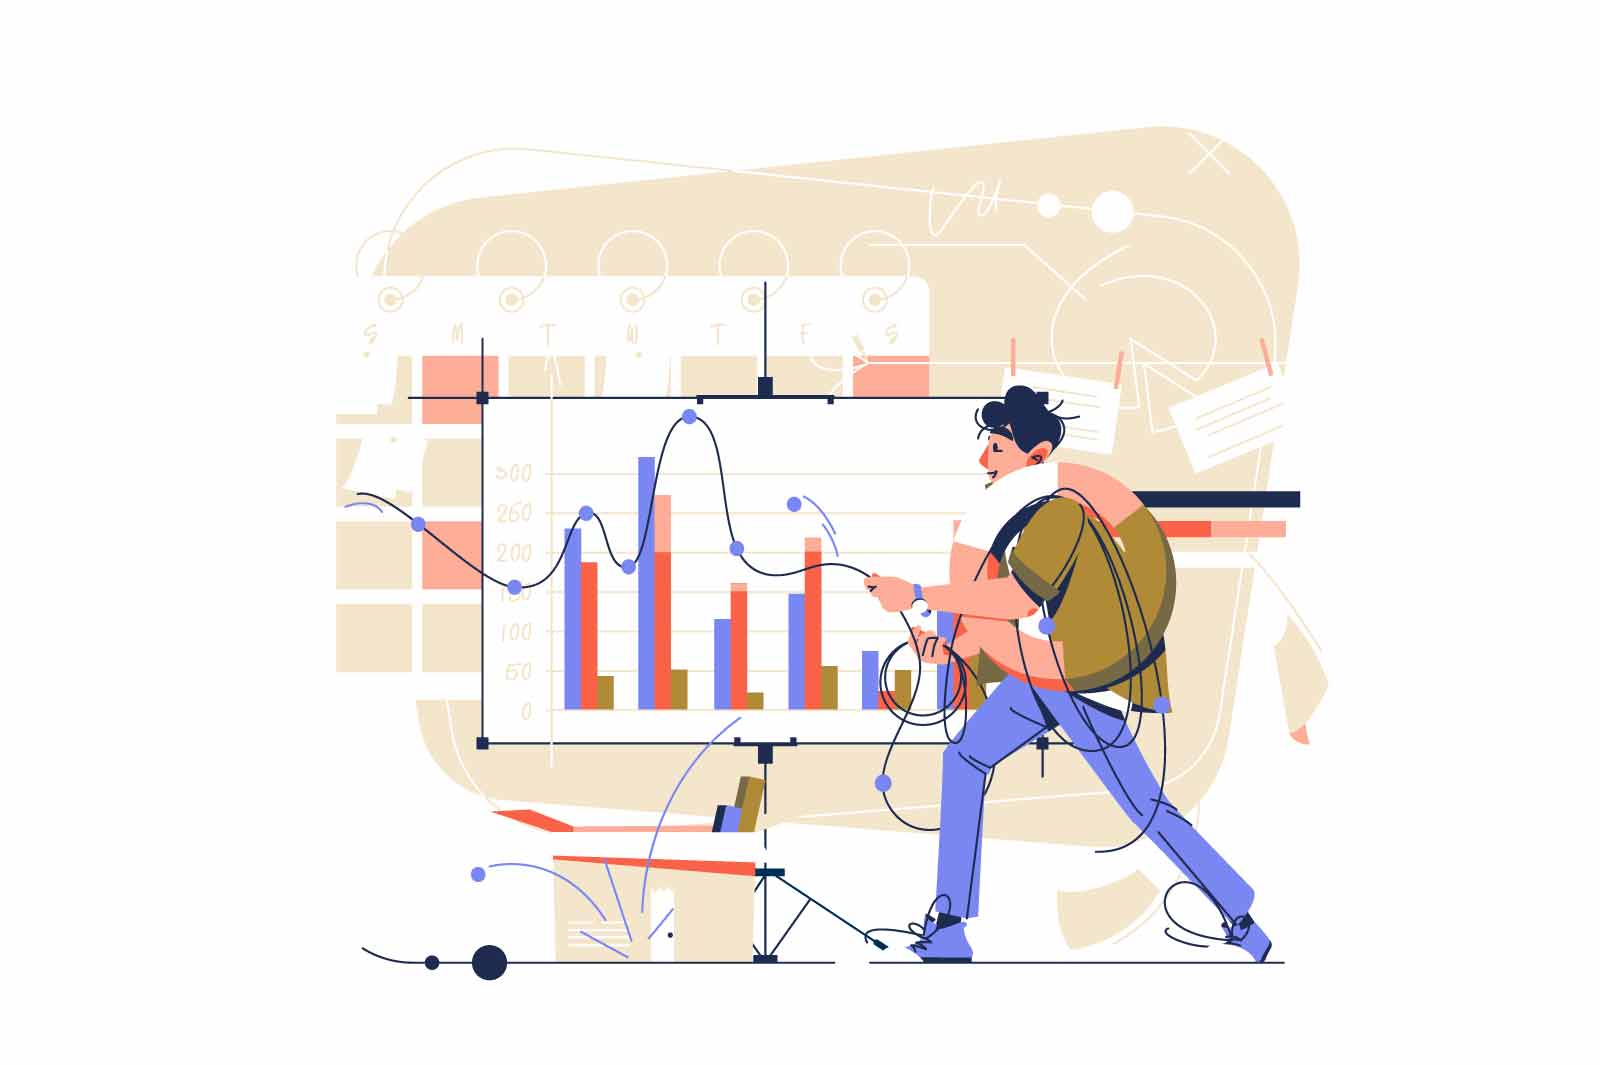 Guy monitor and analyze statistics